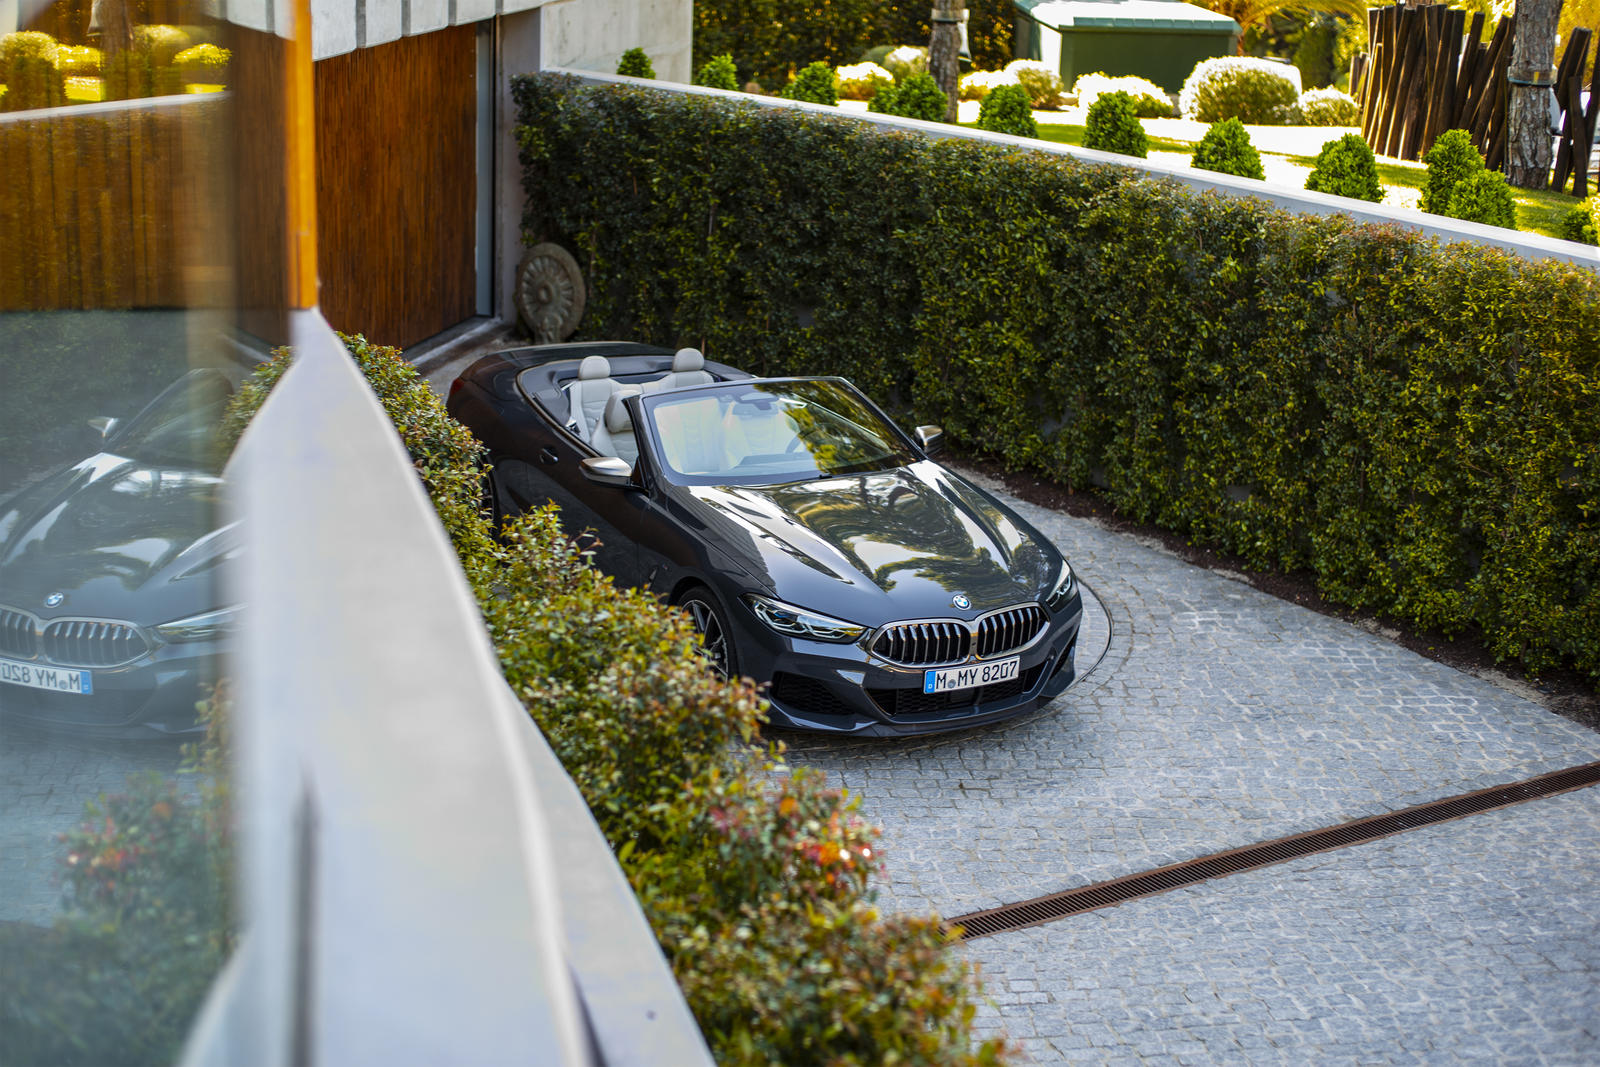 BMW Seria 8 Cabrio - Galerie Foto - BMW Seria 8 Cabrio - Galerie Foto